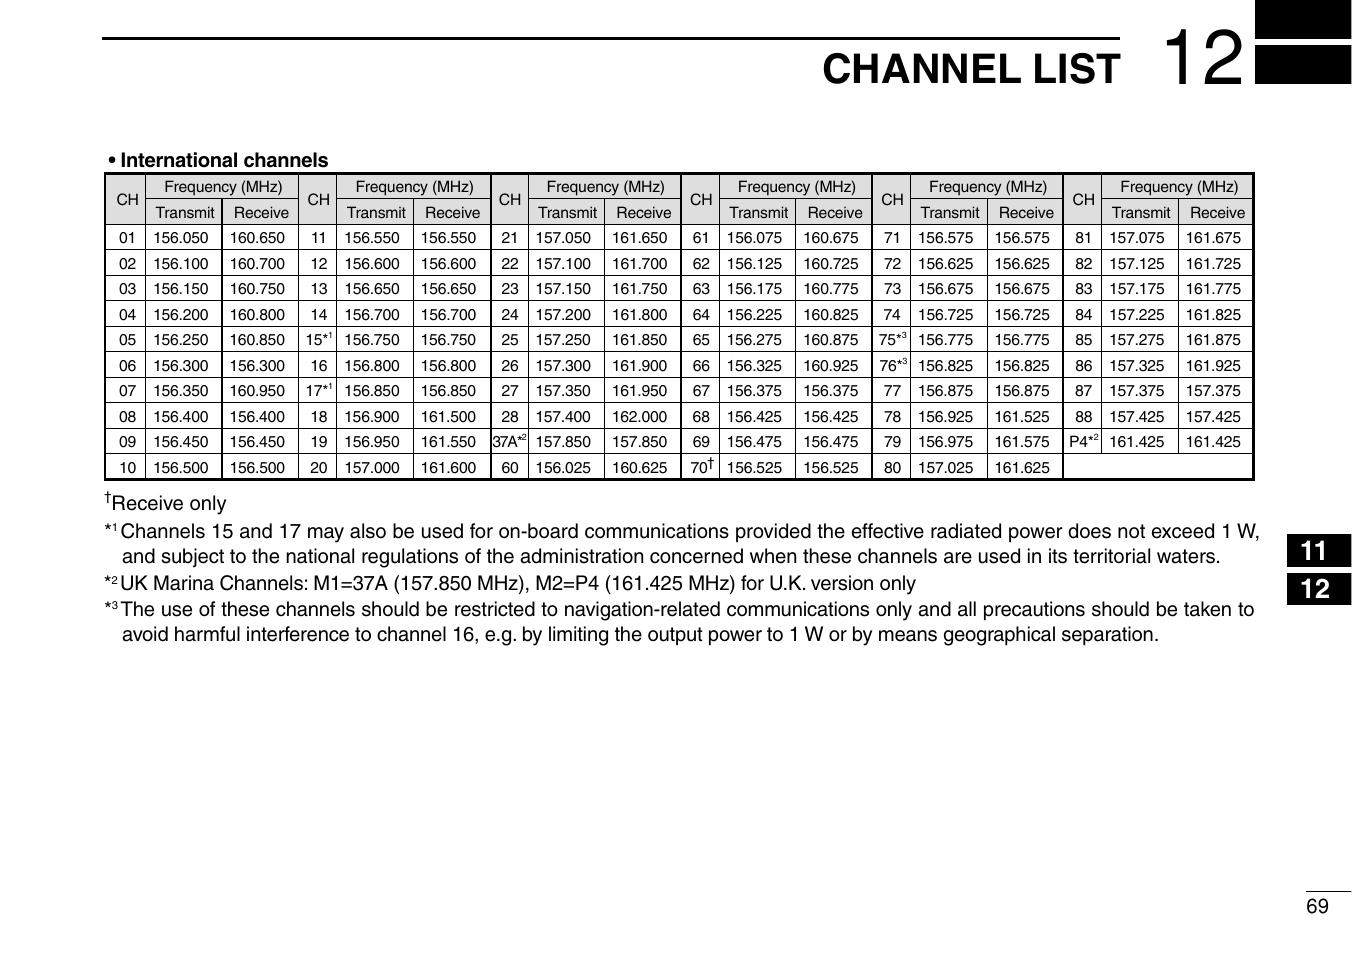 channel list icom ic m505 user manual page 75 80 original mode rh manualsdir com icom ic-m505 instruction manual Logitech M505 Not Working